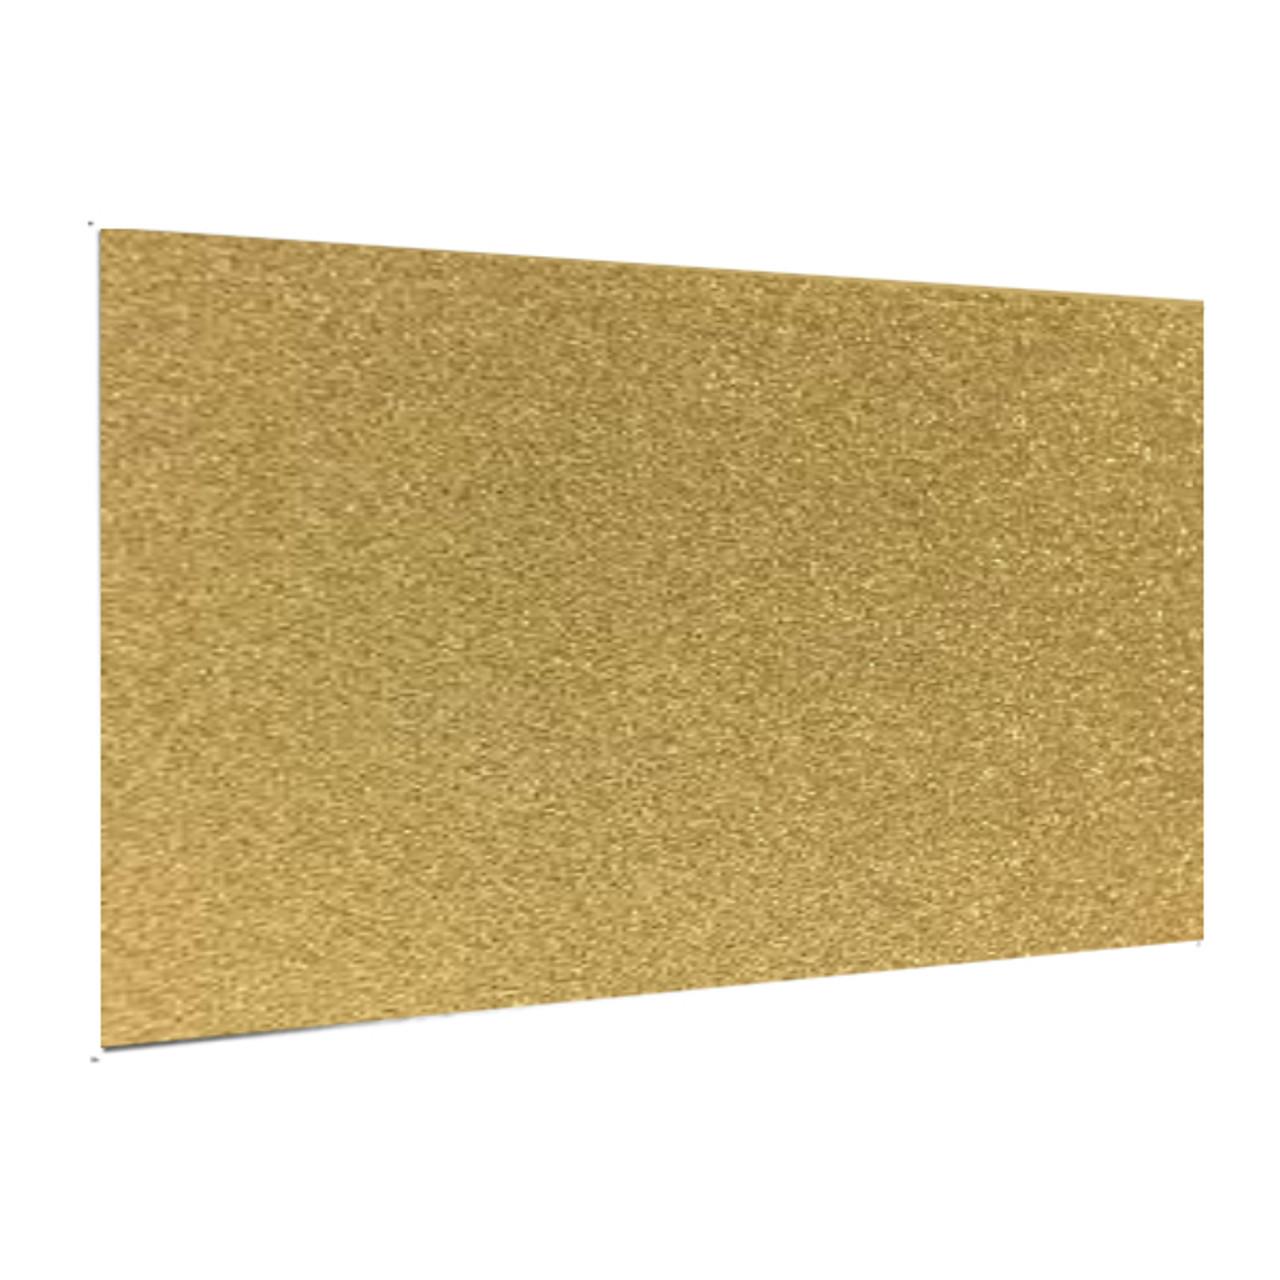 "Showcard - Gold Fillet - 32"" x 40"""